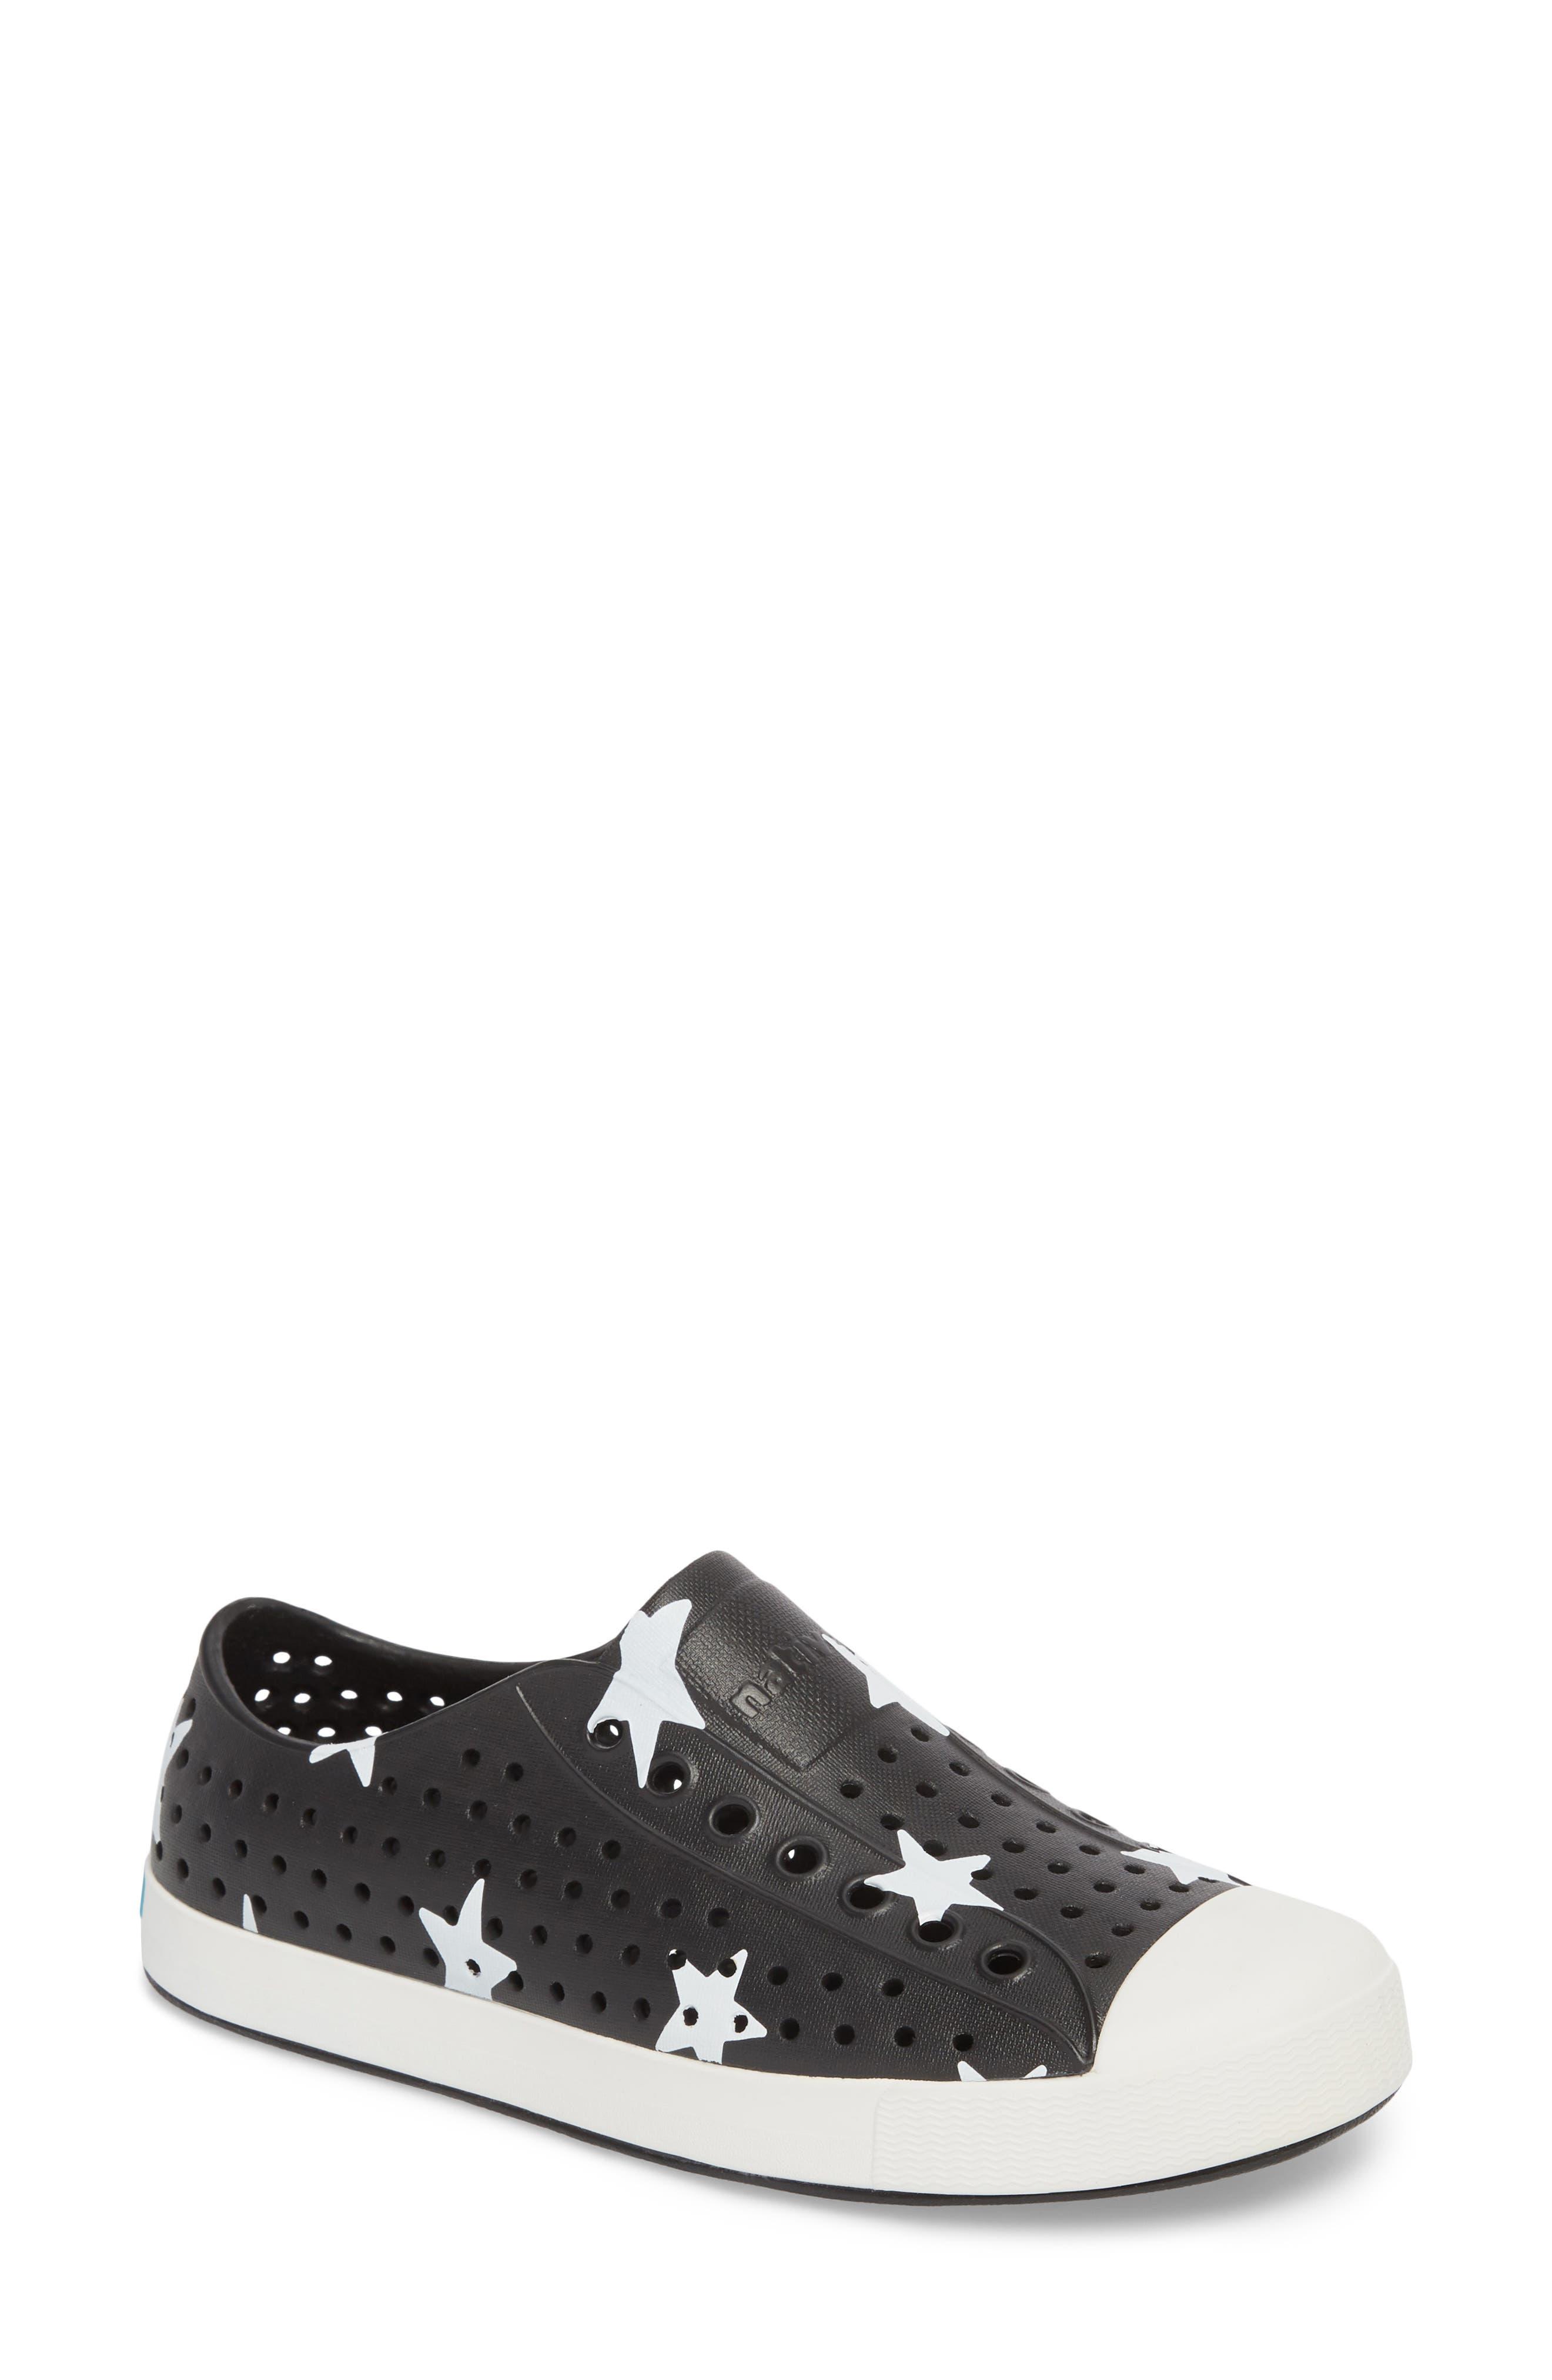 'Jefferson' Printed Slip-On Sneaker,                             Main thumbnail 1, color,                             Jiffy Black/ White/ Big Star